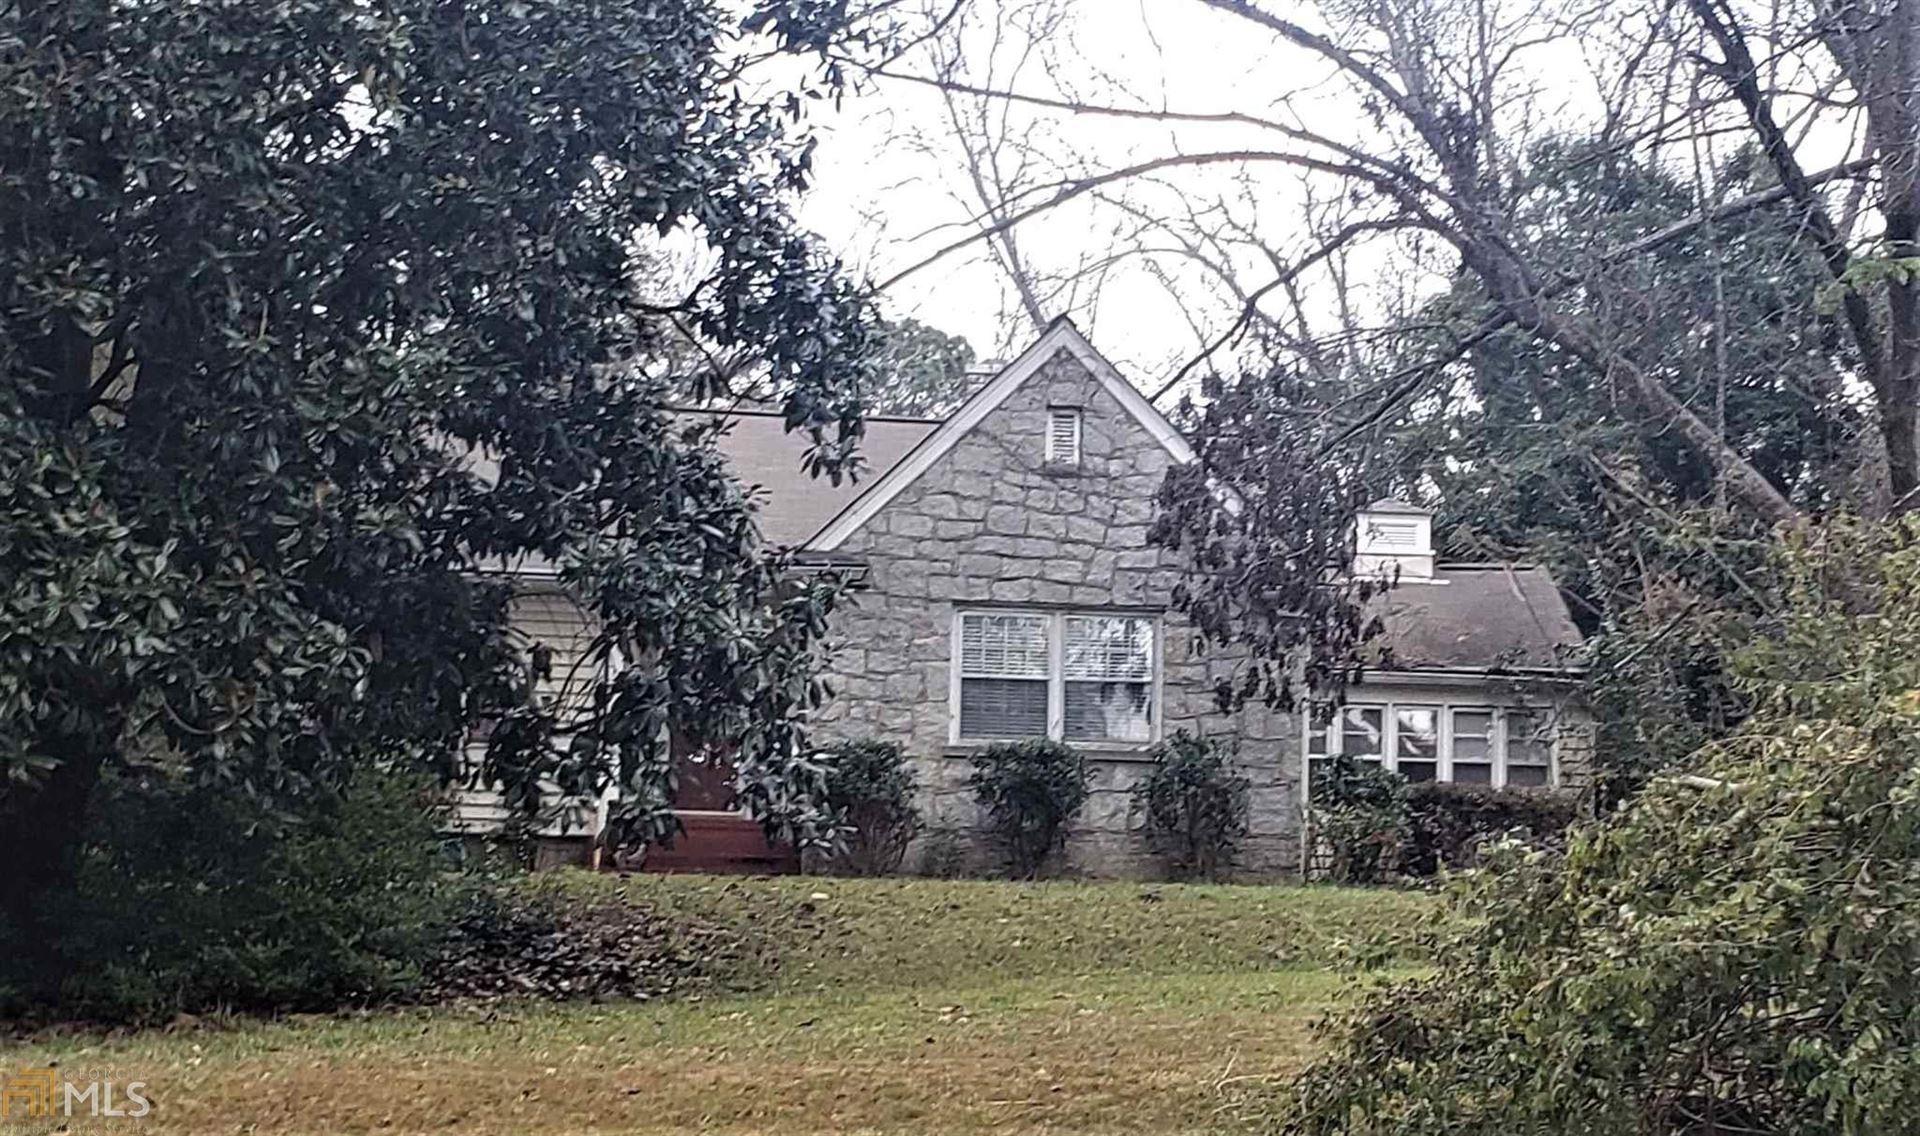 6686 Old Covington Rd, Lithonia, GA 30058 - MLS#: 8905444